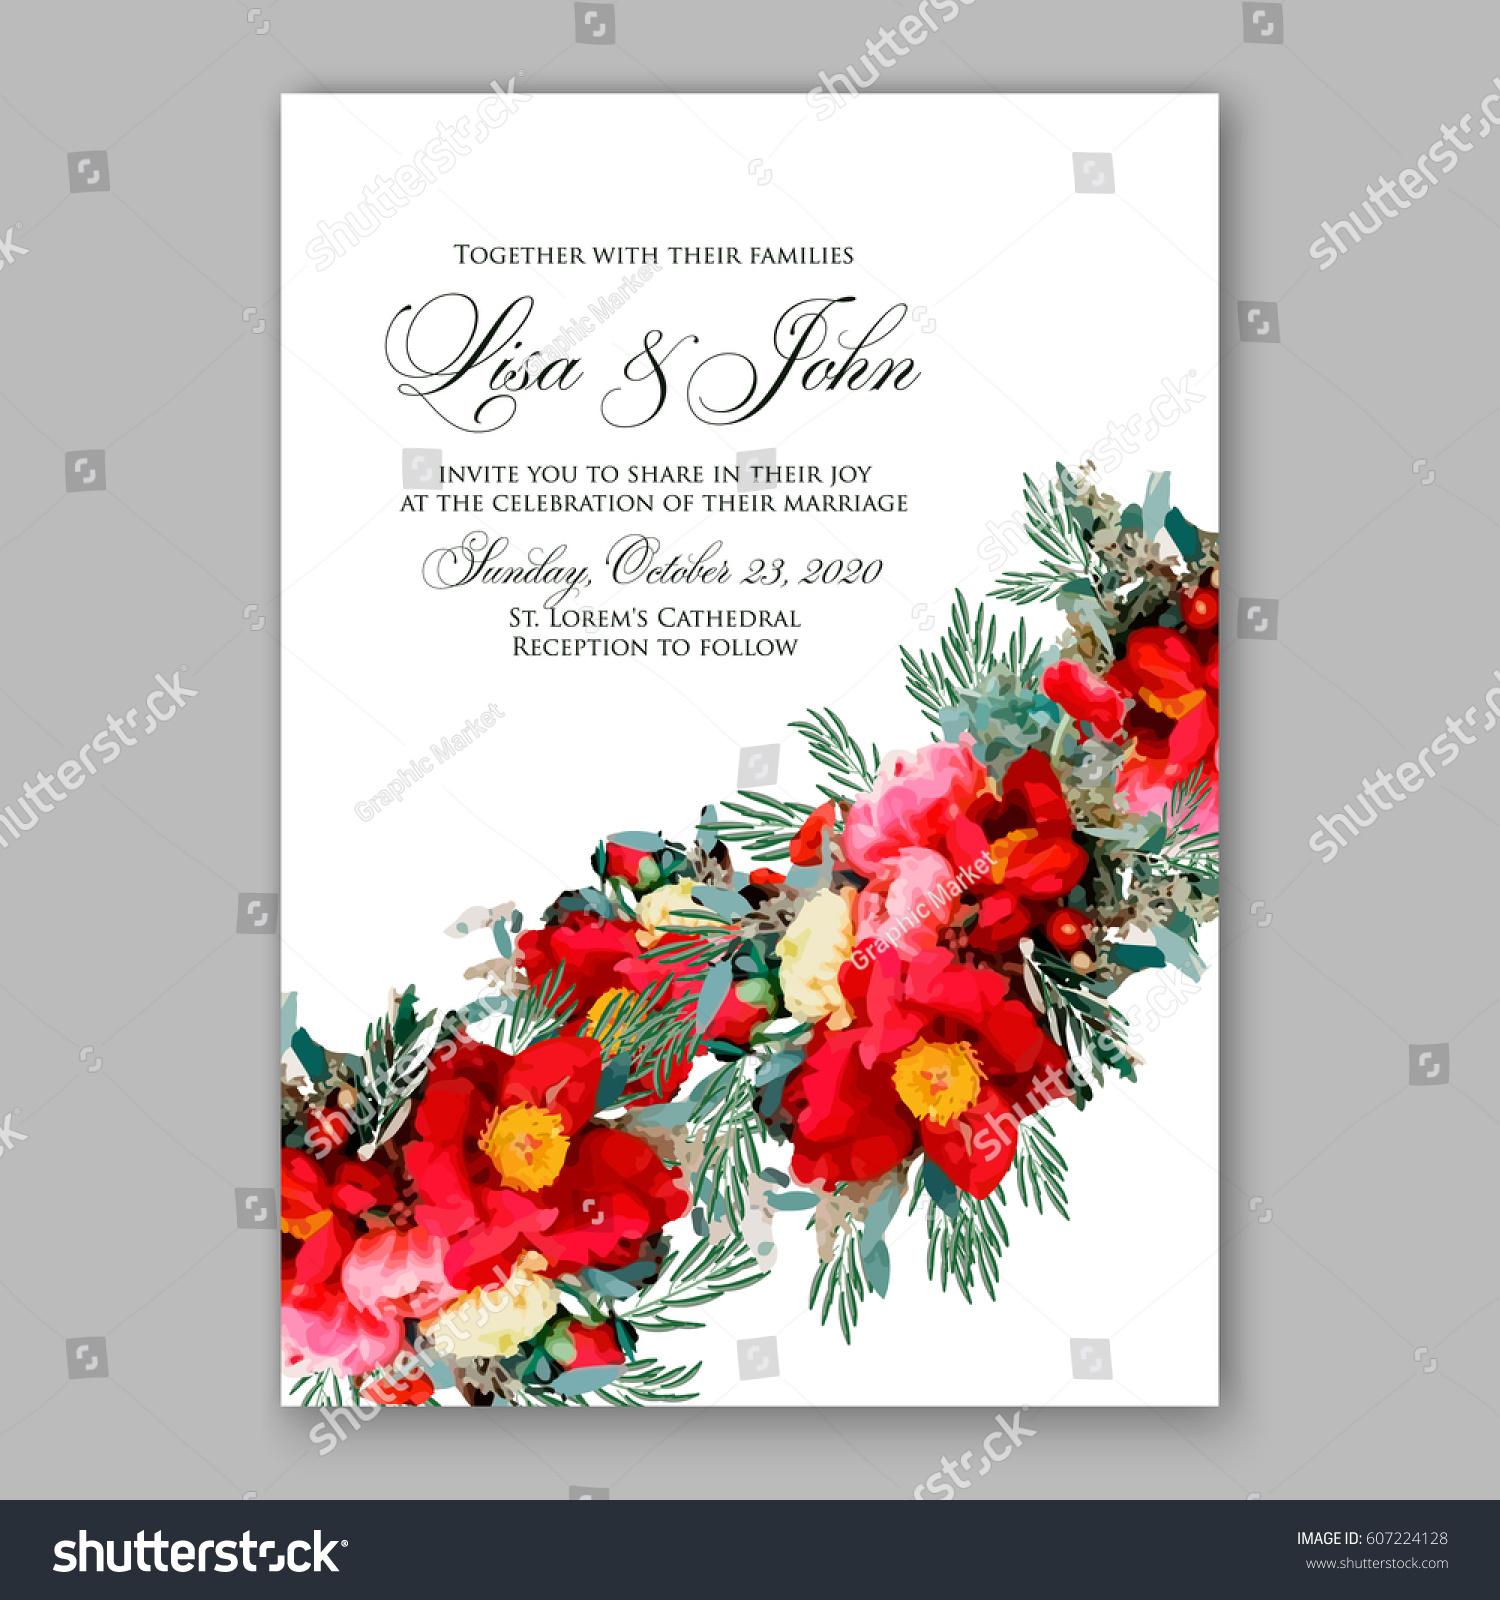 Ranunculus Red Wedding Invitation Peony Anemone Stock Vector HD ...